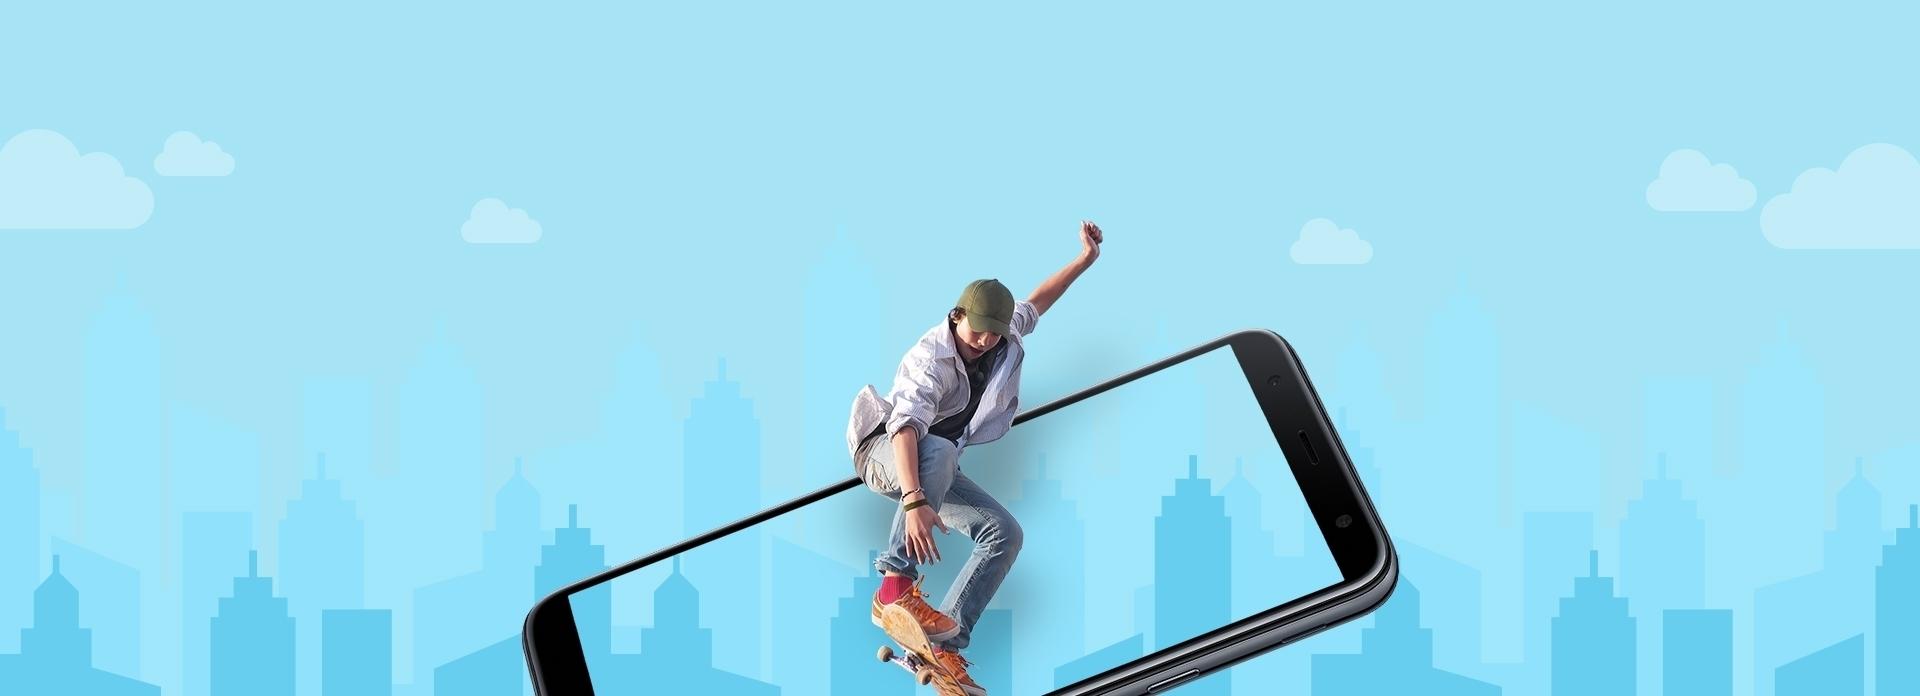 Performance - Samsung Galaxy J4+